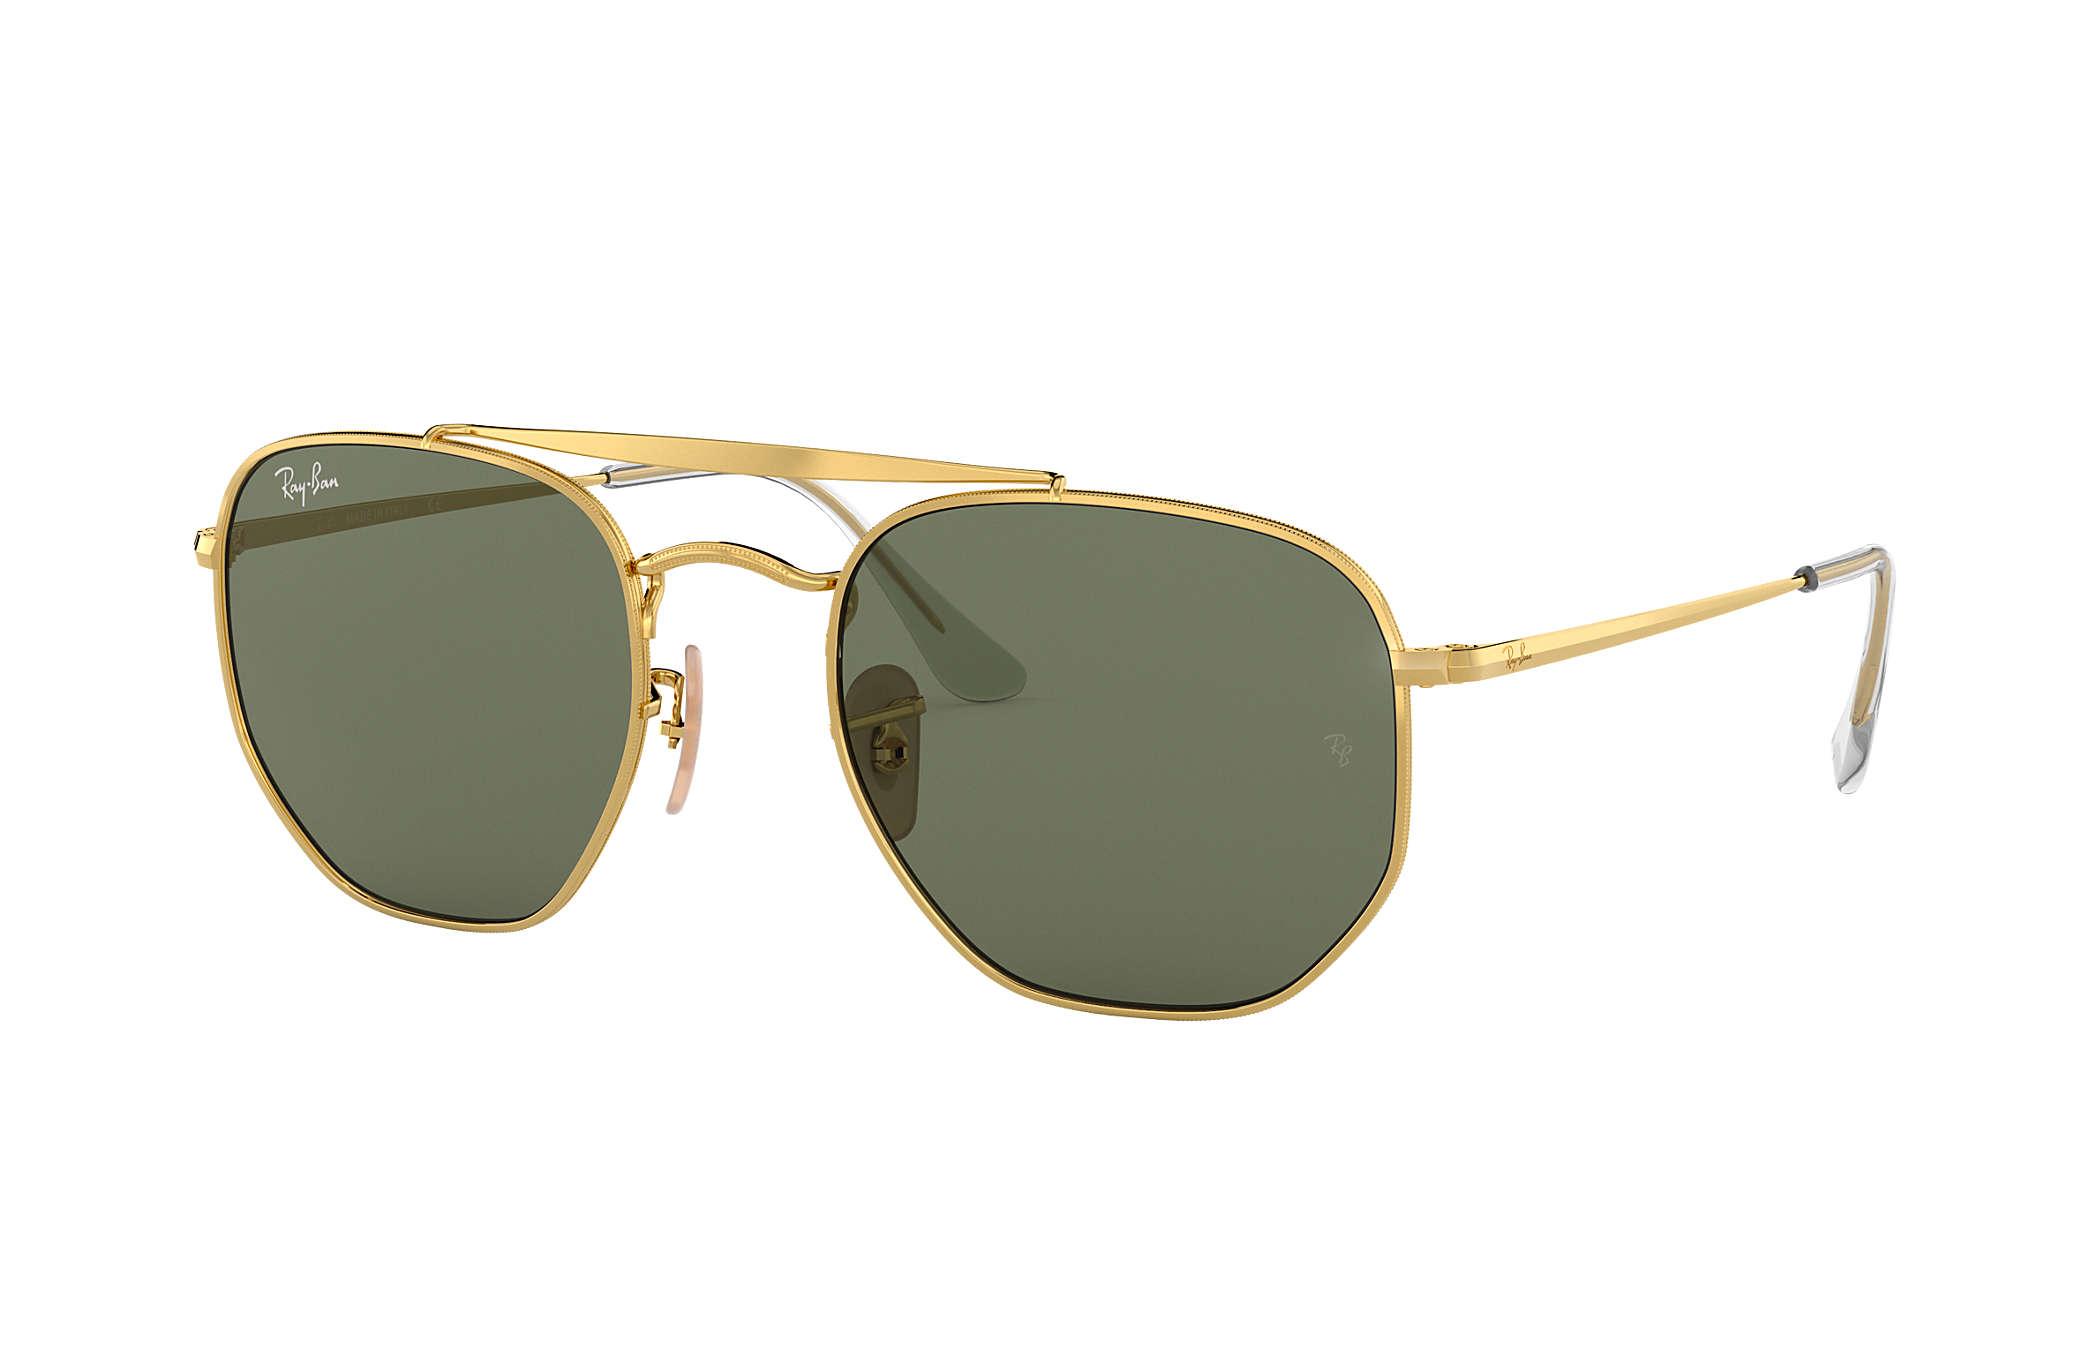 8f90c448f9318 Ray-Ban Marshal RB3648 Gold - Metal - Green Lenses - 0RB364800154 ...